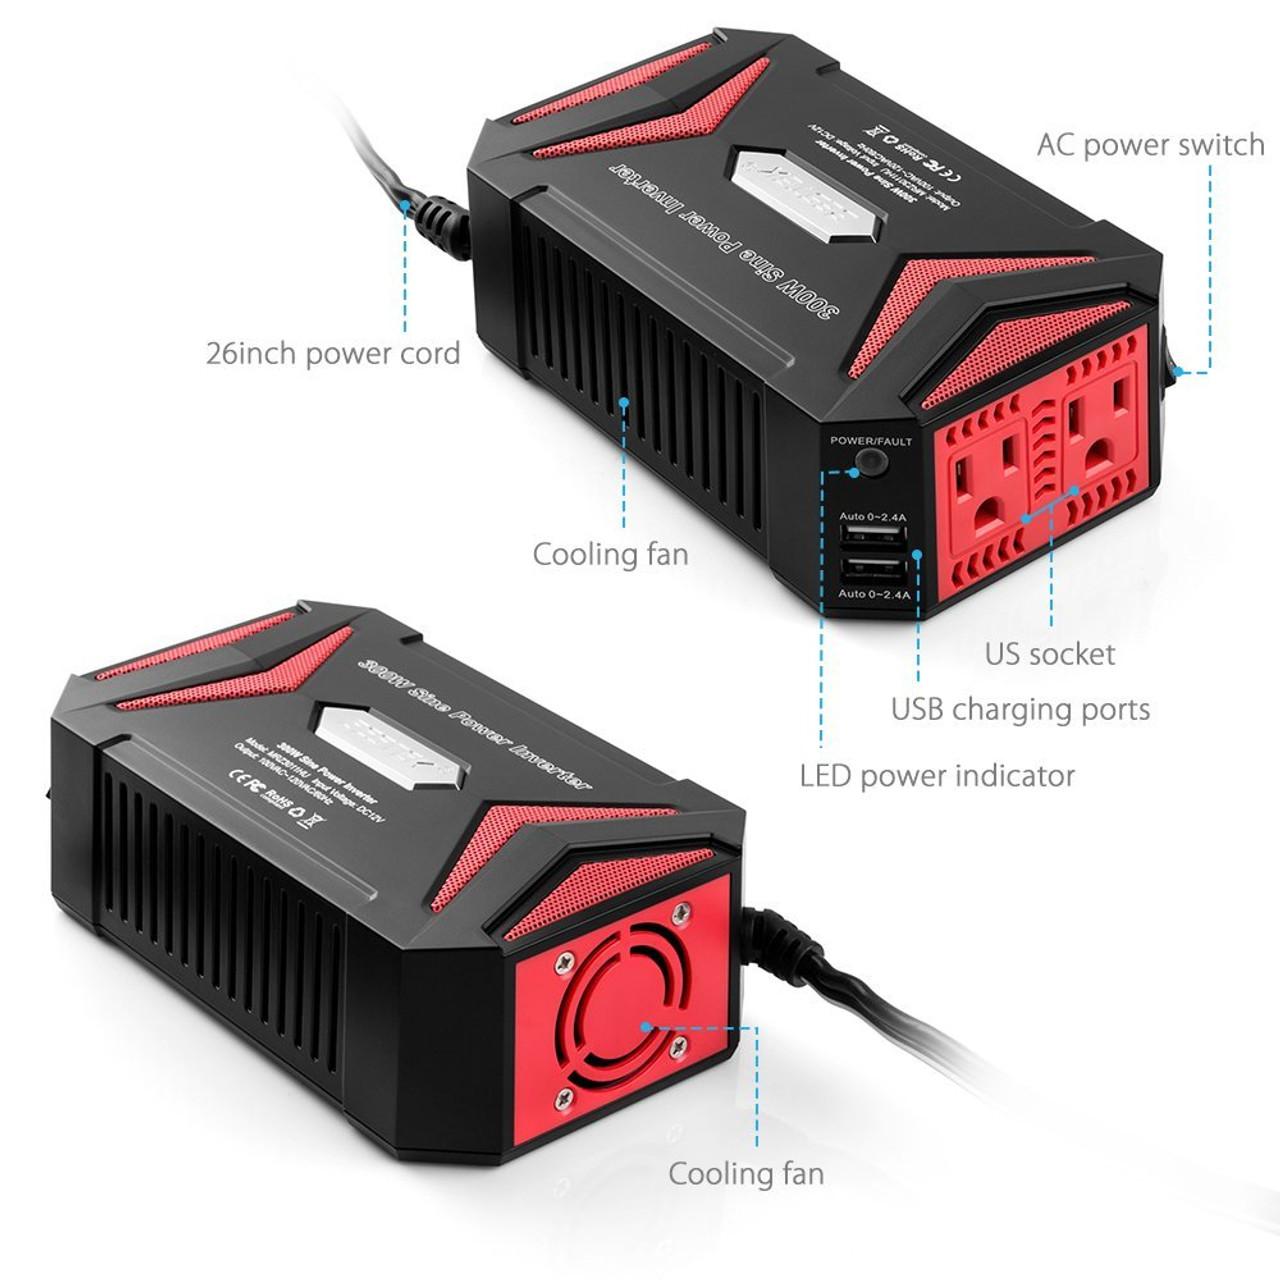 BESTEK 300 Watt Pure Sine Wave Power Inverter